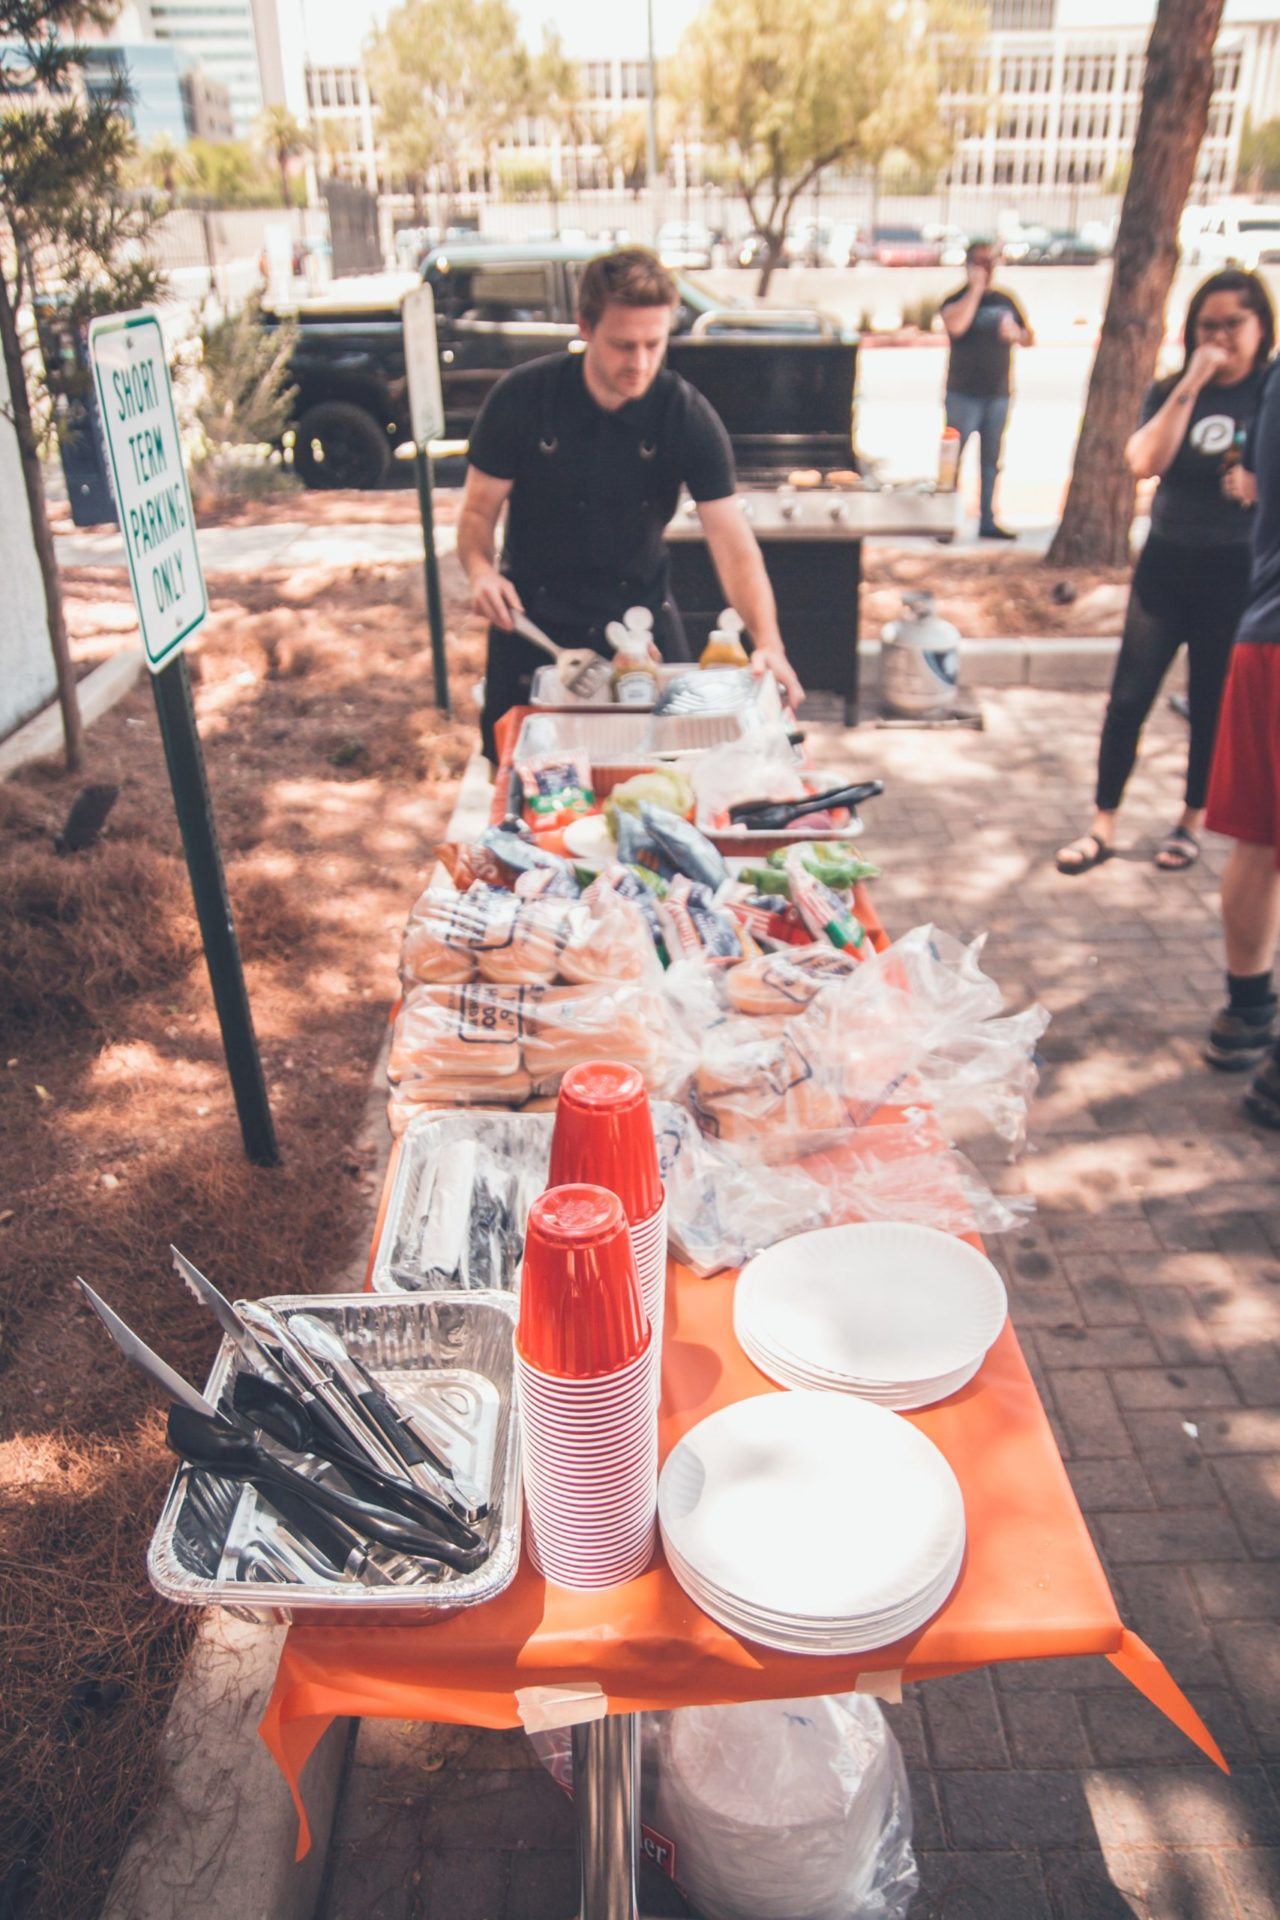 10 Essential Food & Beverage Reads For Memorial Day Weekend